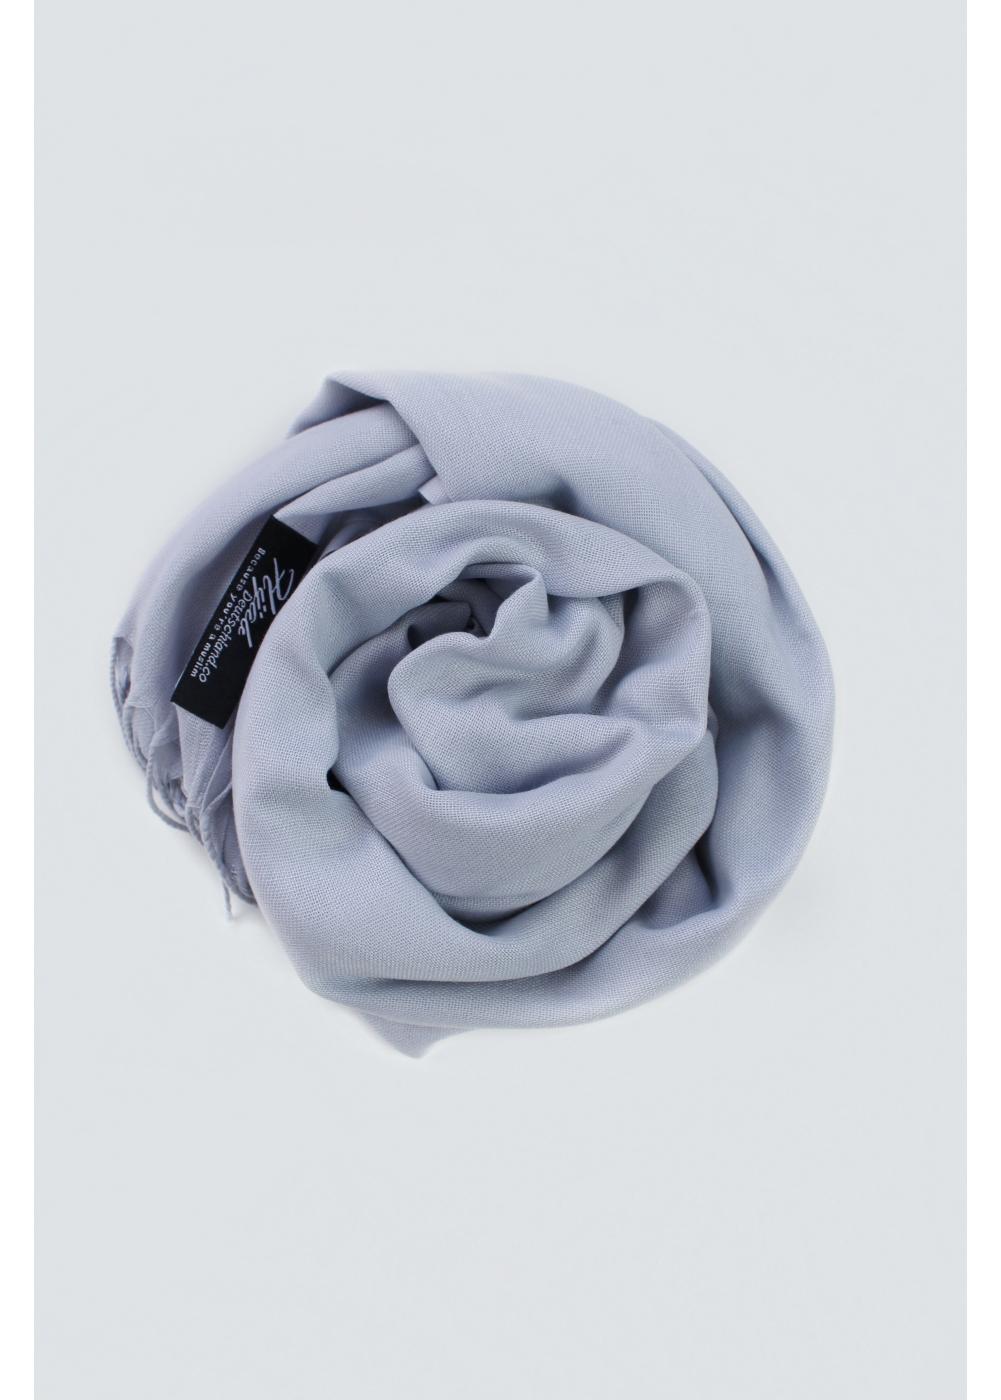 Pashmina hijab Silver blue